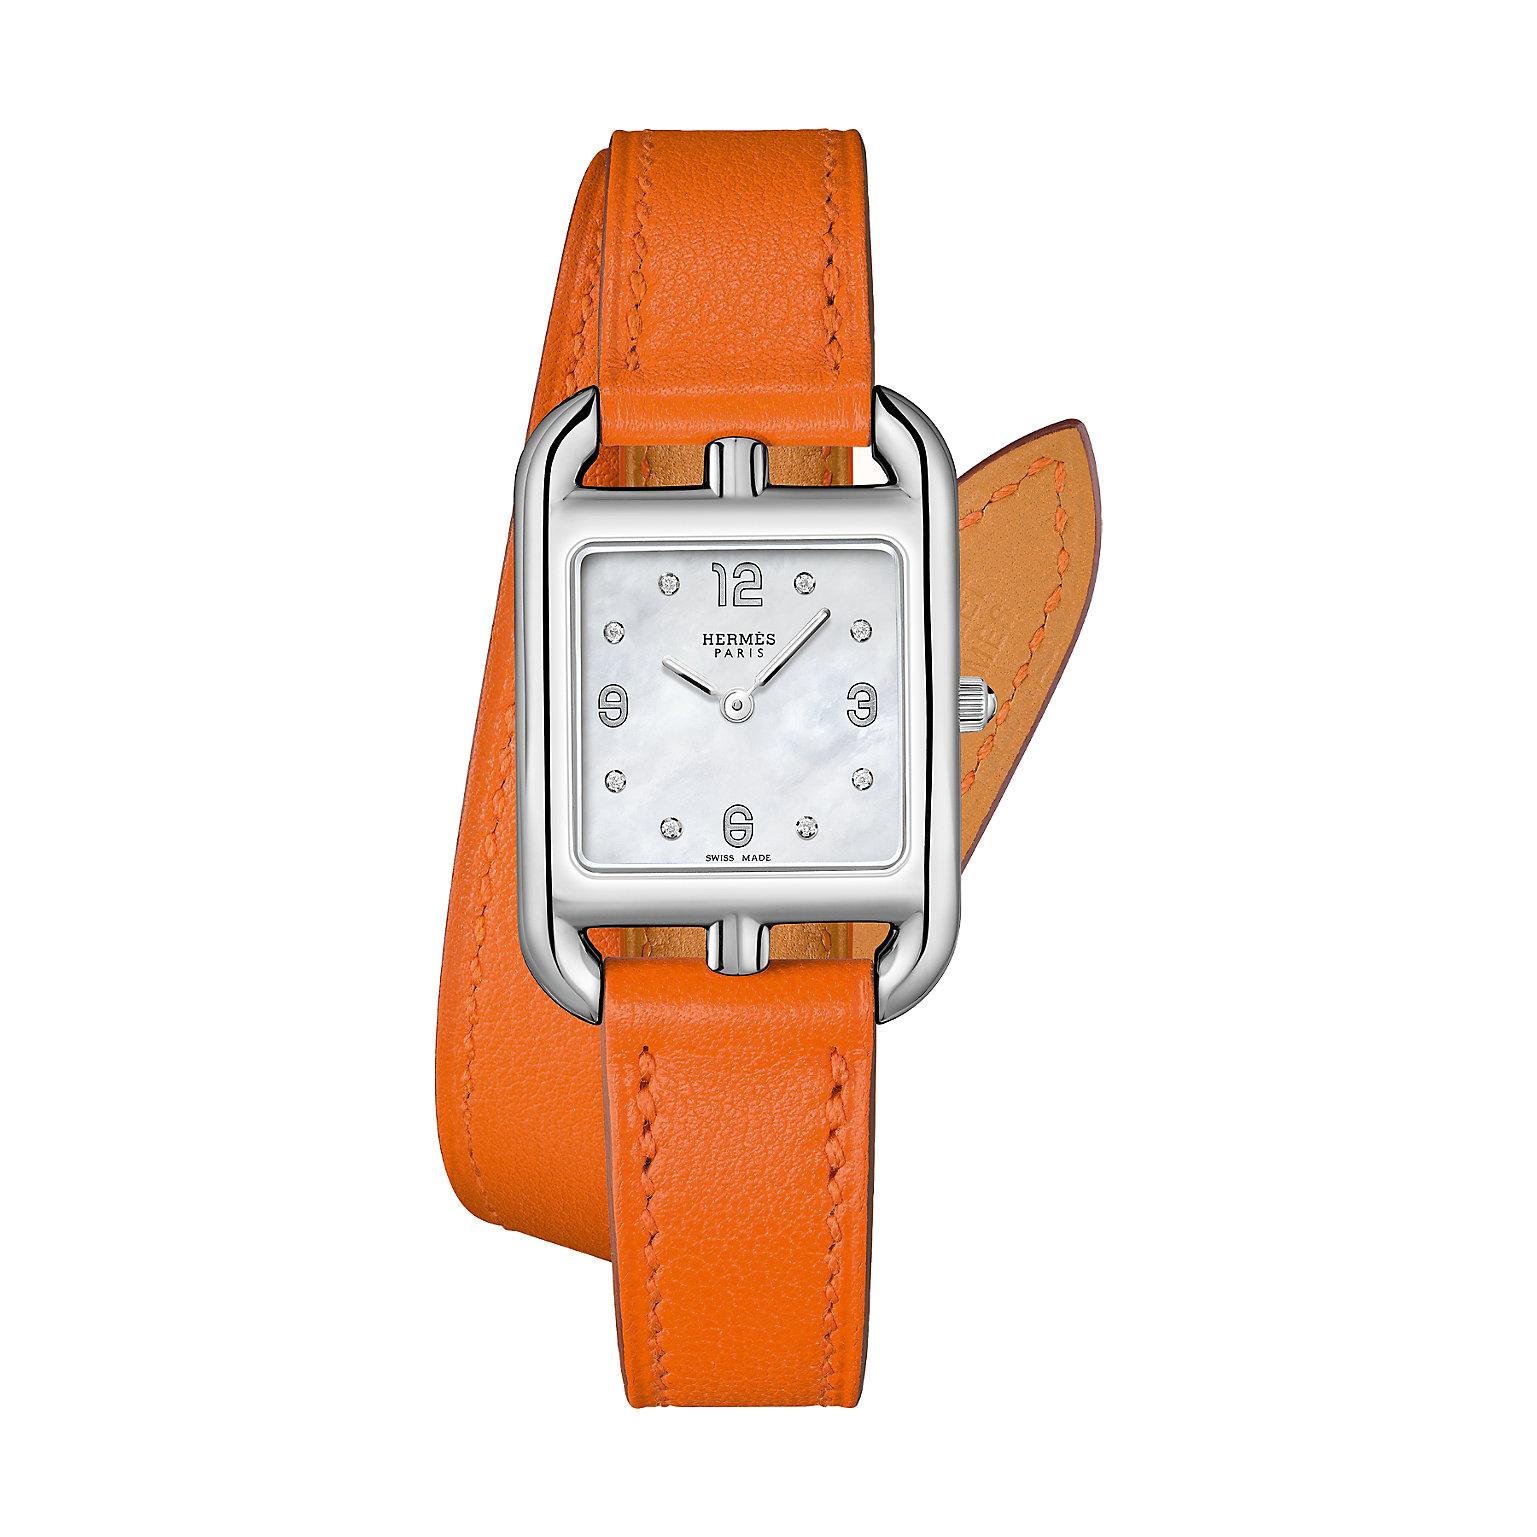 Hermès-cape-cod-23-x-23mm-Hall-of-Time-044312WW00